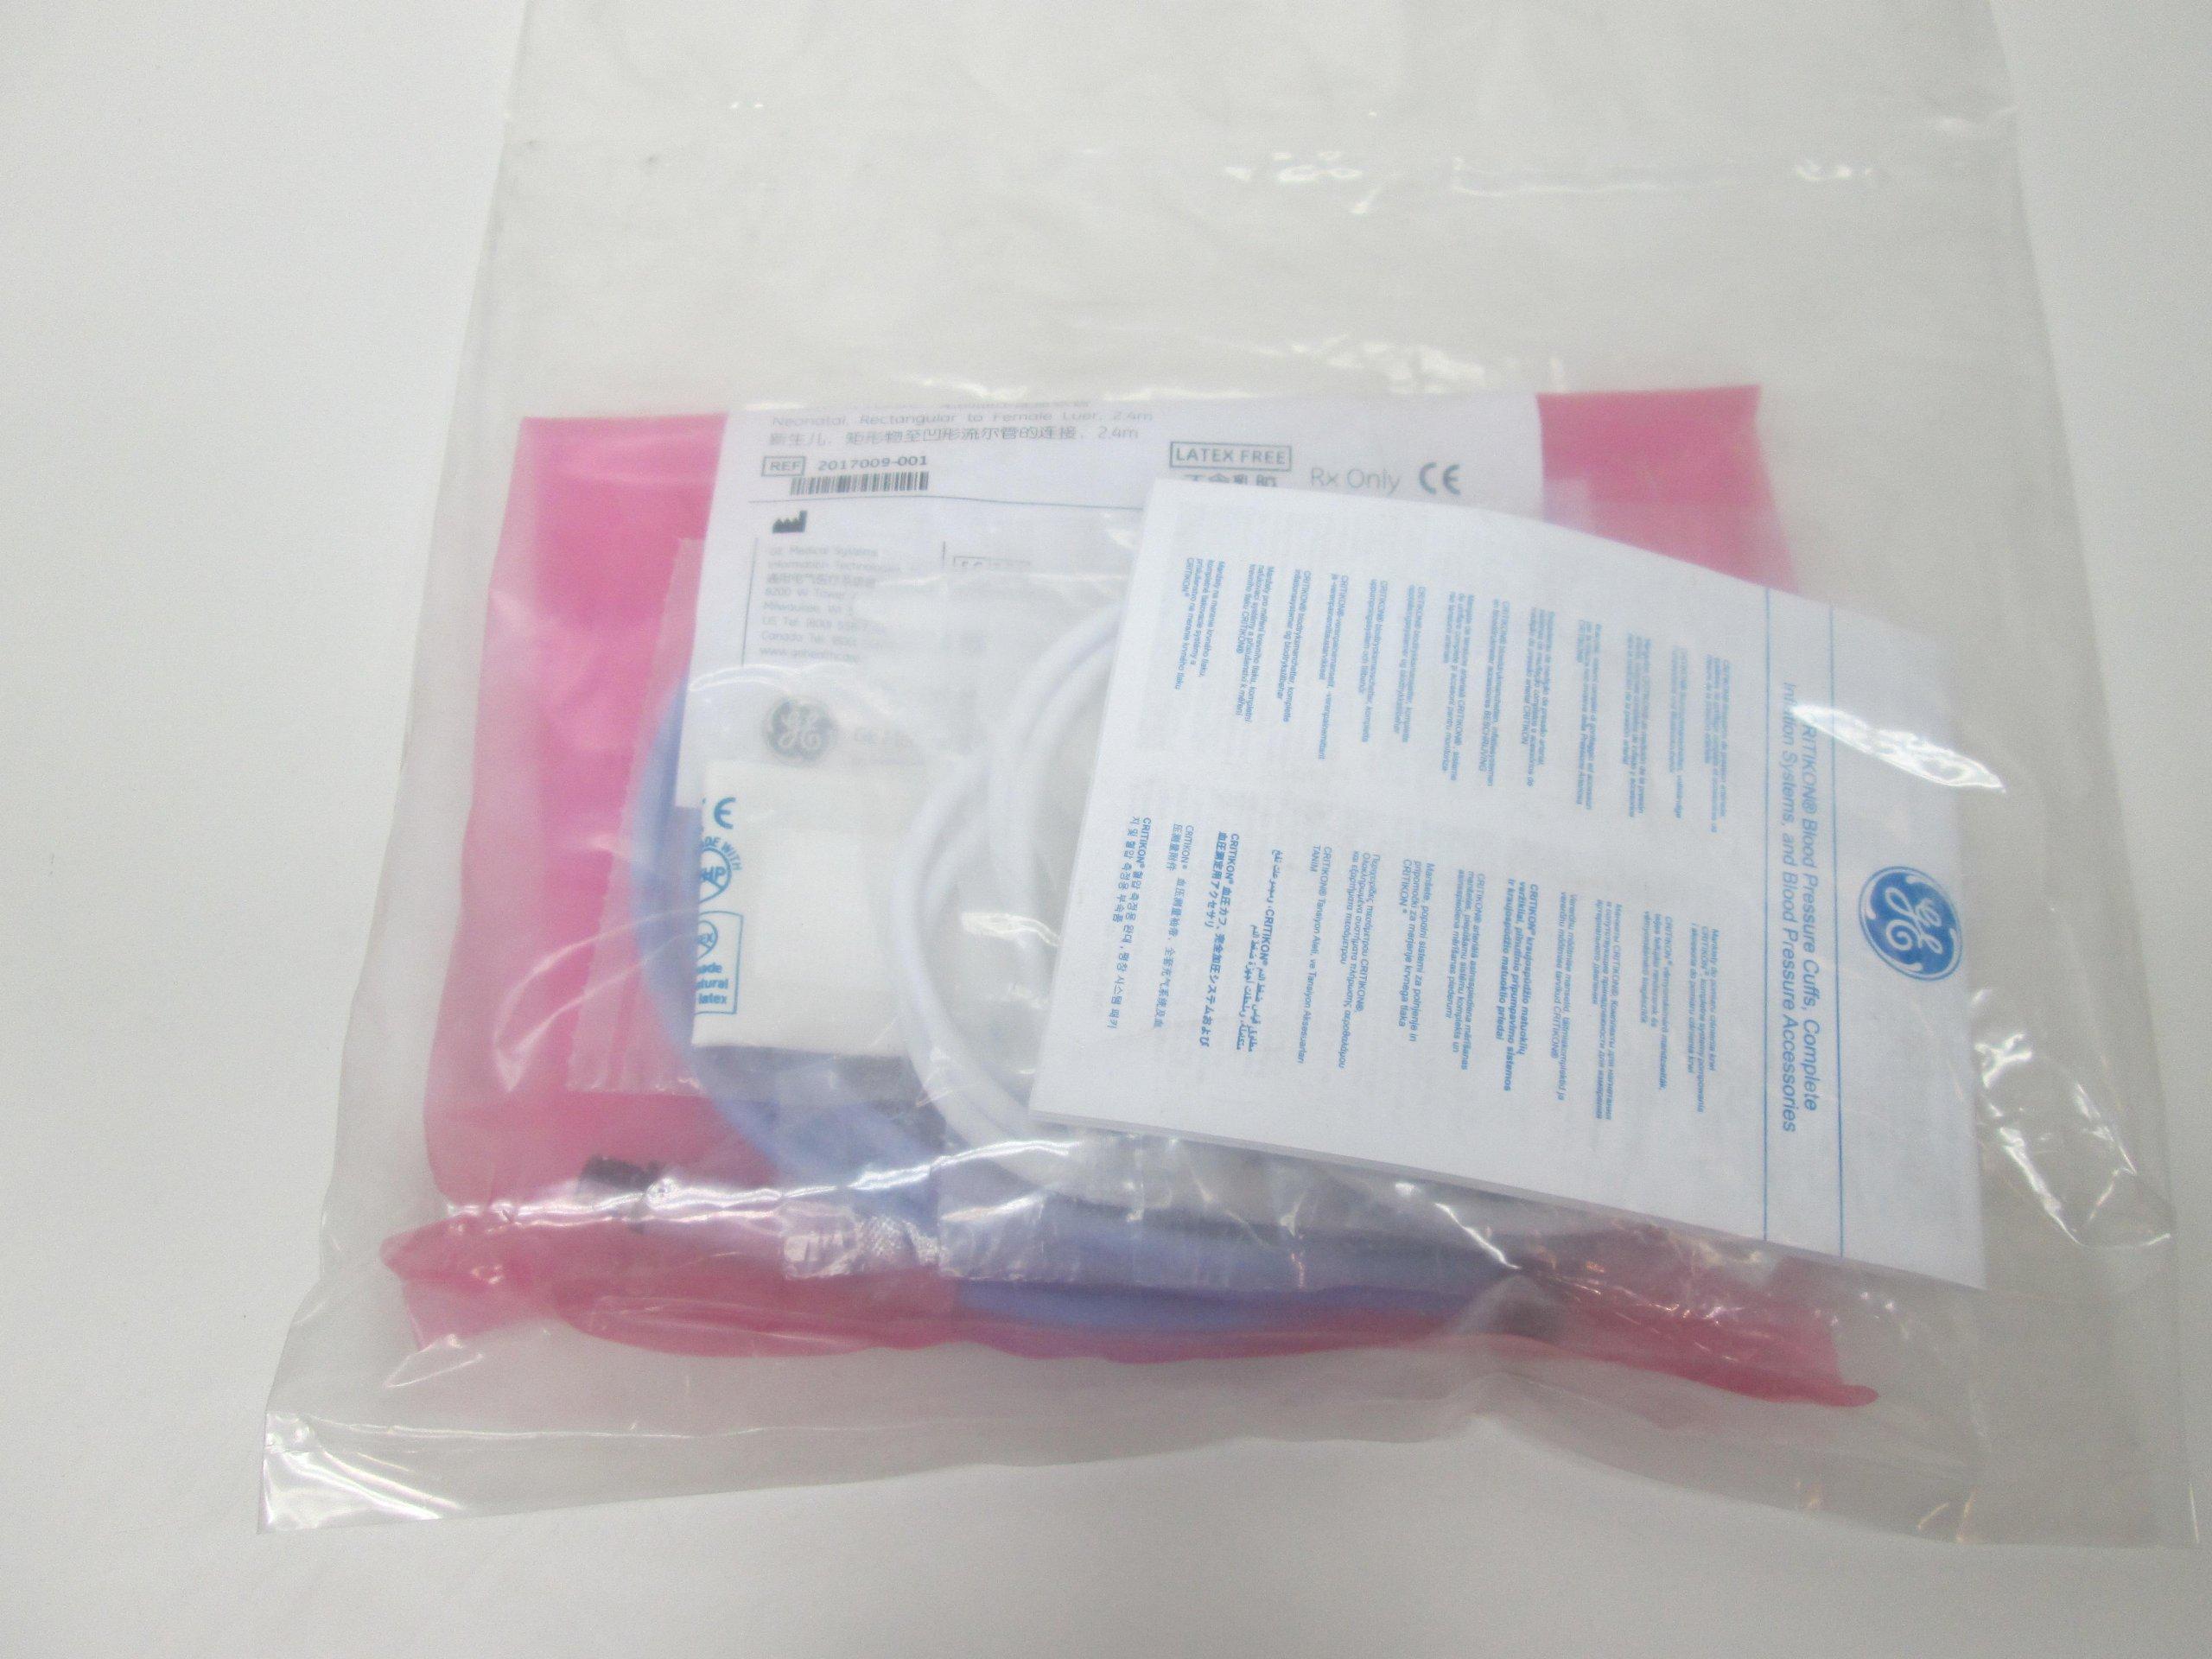 GE Healthcare 2017009-001 Blood Pressure Tubing Air Hose, Non-Invasive Blood Pressure, Neonatal, Female Slip Luer Connector, 2.4 m Length